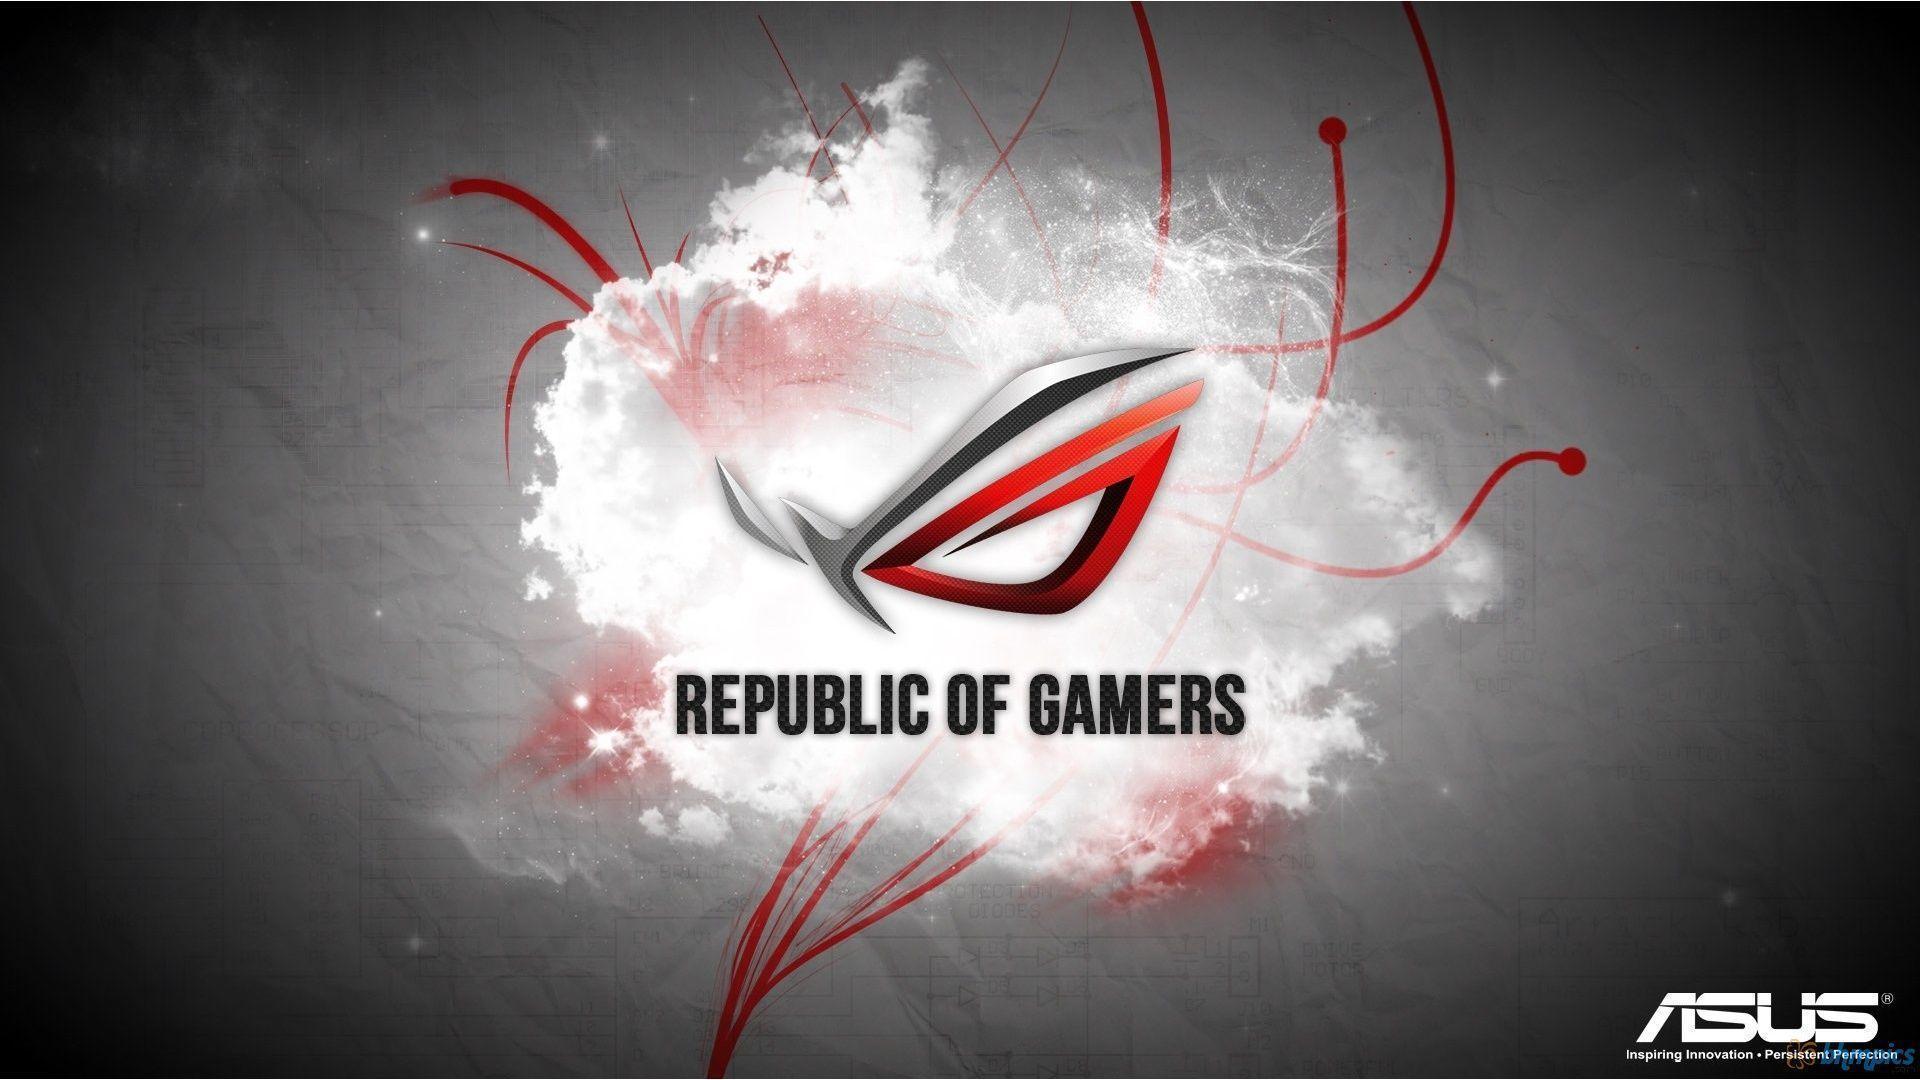 Asus Republic Of Gamers Wallpapers 1920x1080